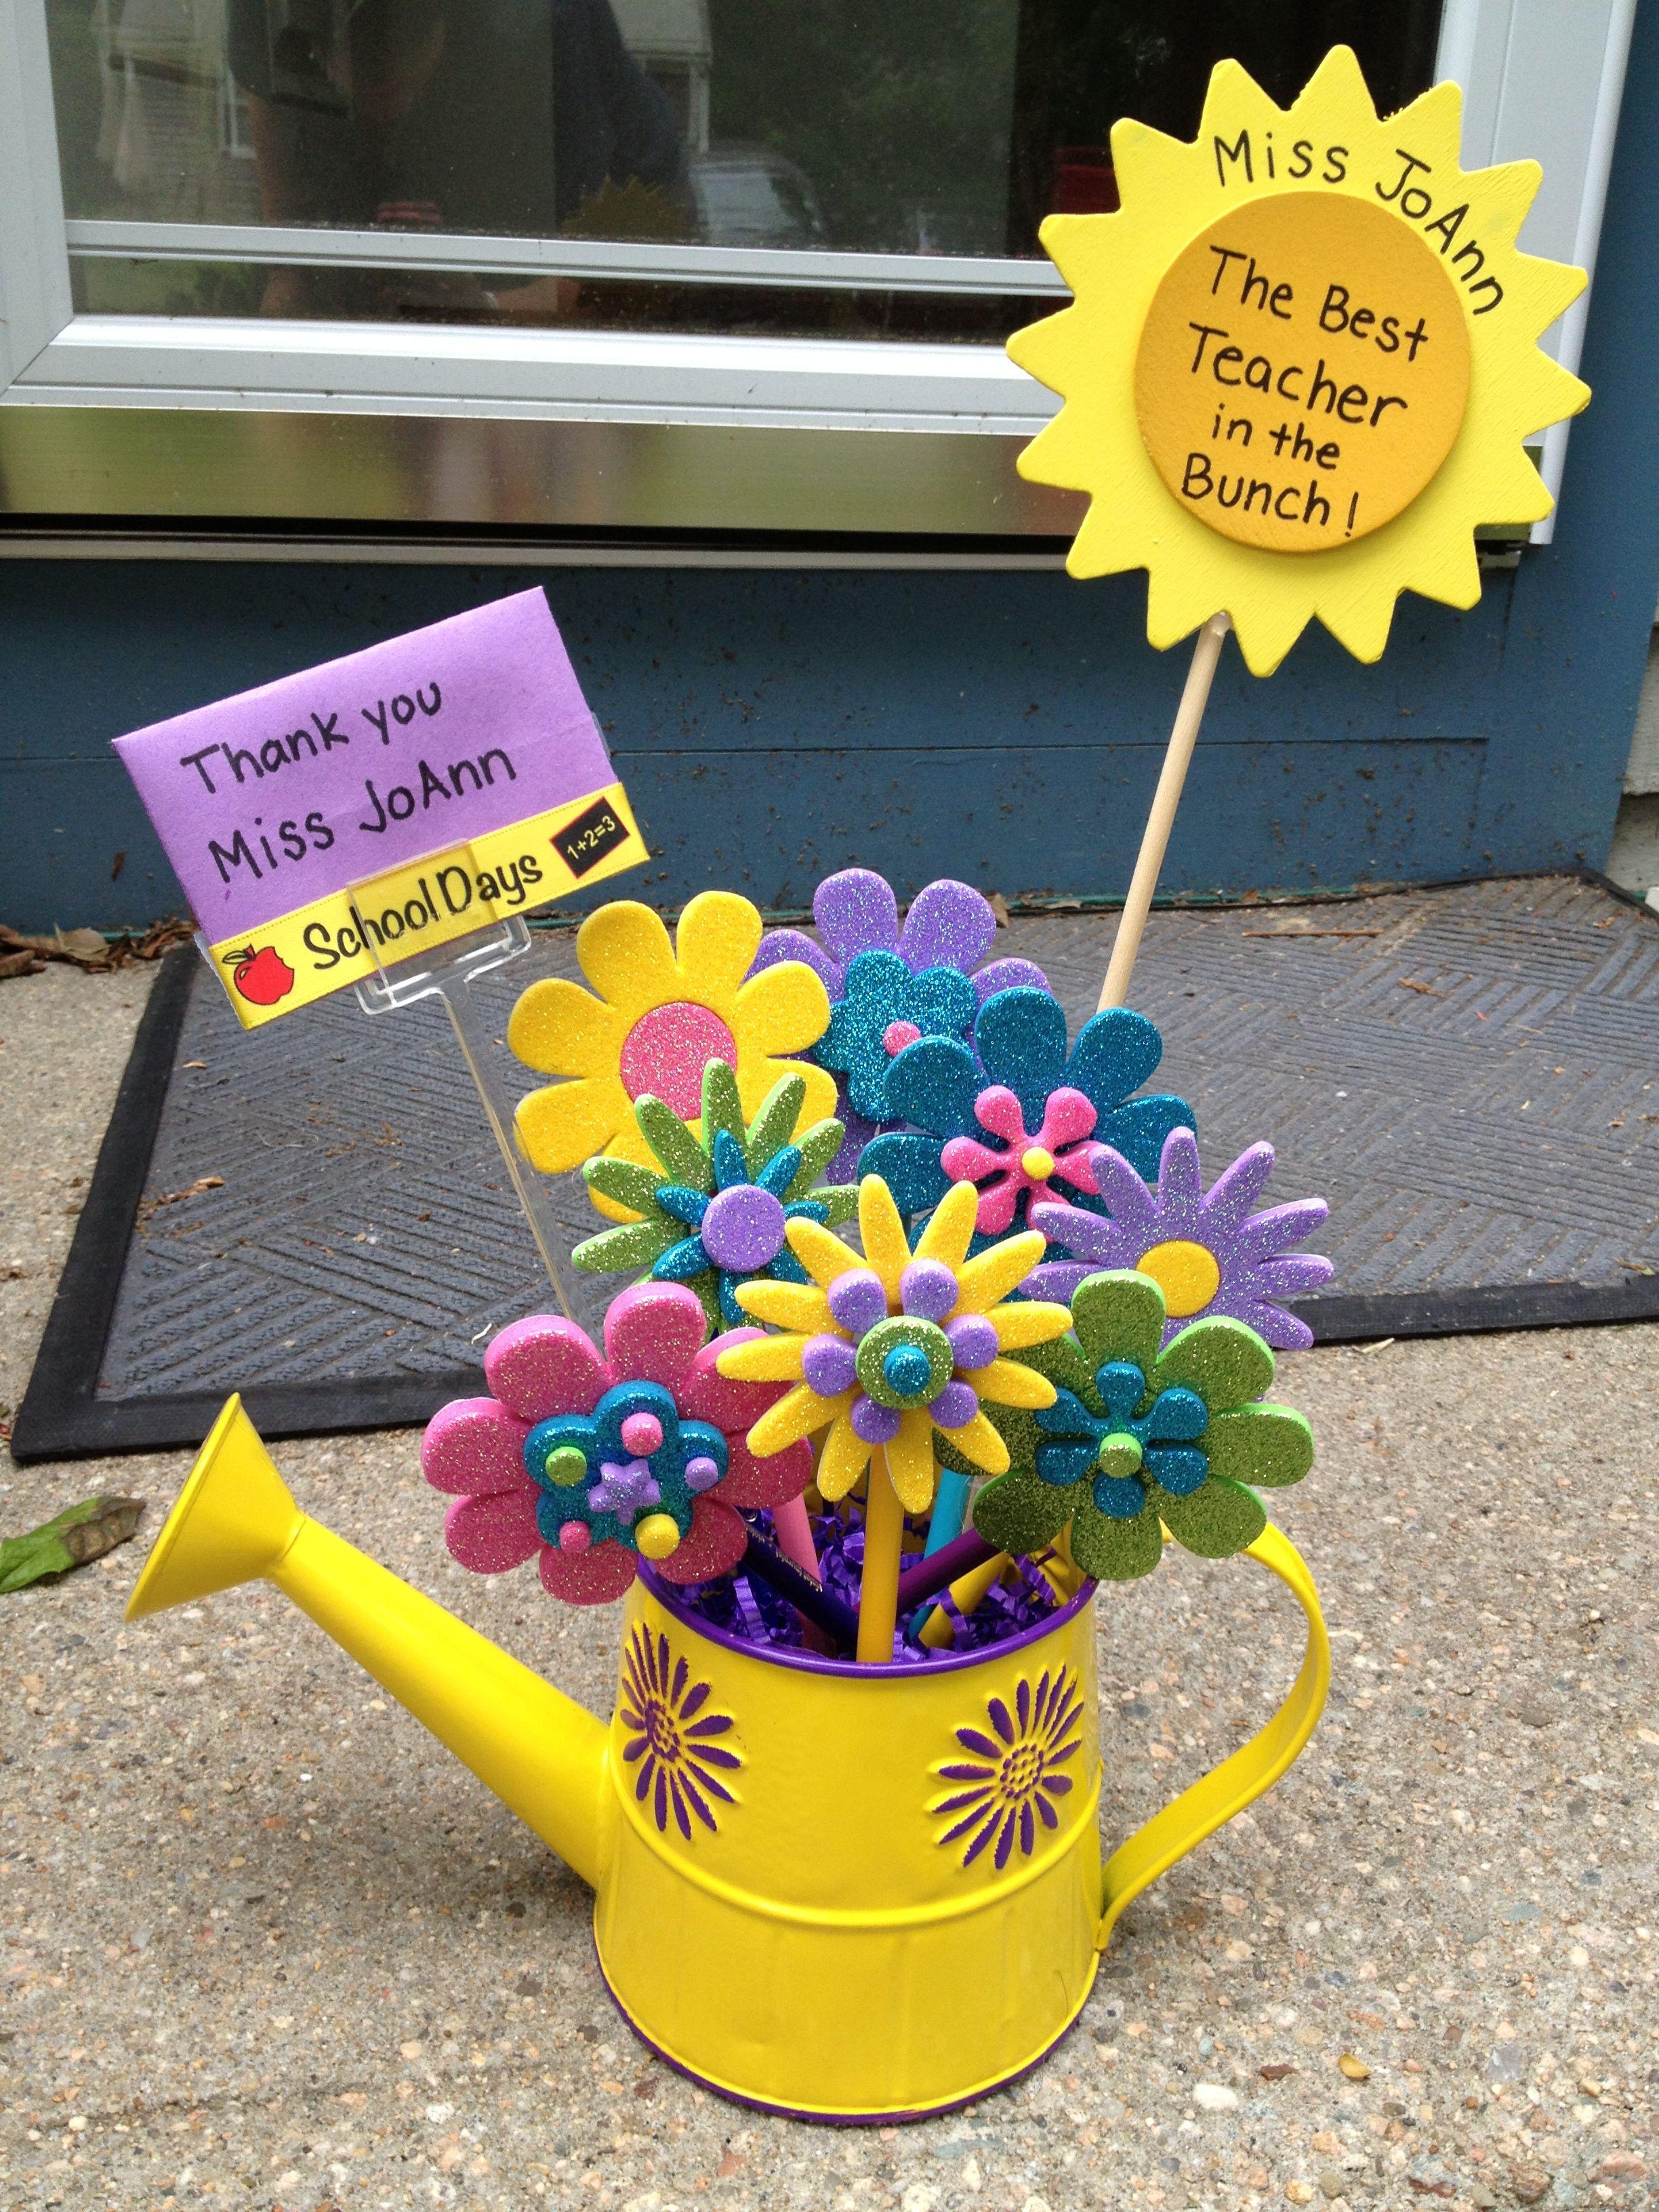 Find adorable ice cream scoopers - Thoughtful Teacher ... |Preschool Teacher Gifts Books